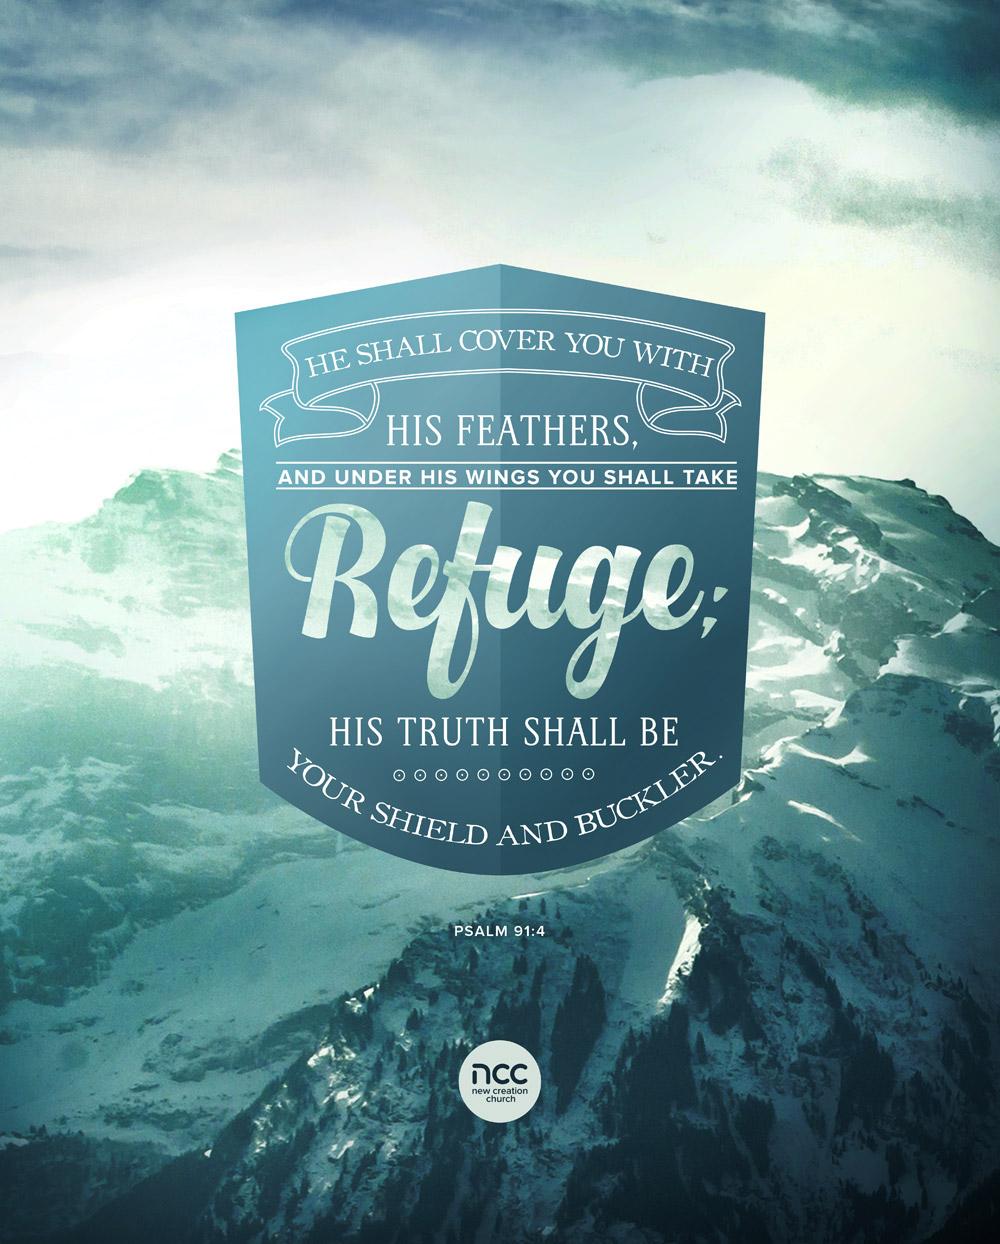 6_JUN Gottes Versprechen – Bibelverse zur Ermutigung   New Creation TV